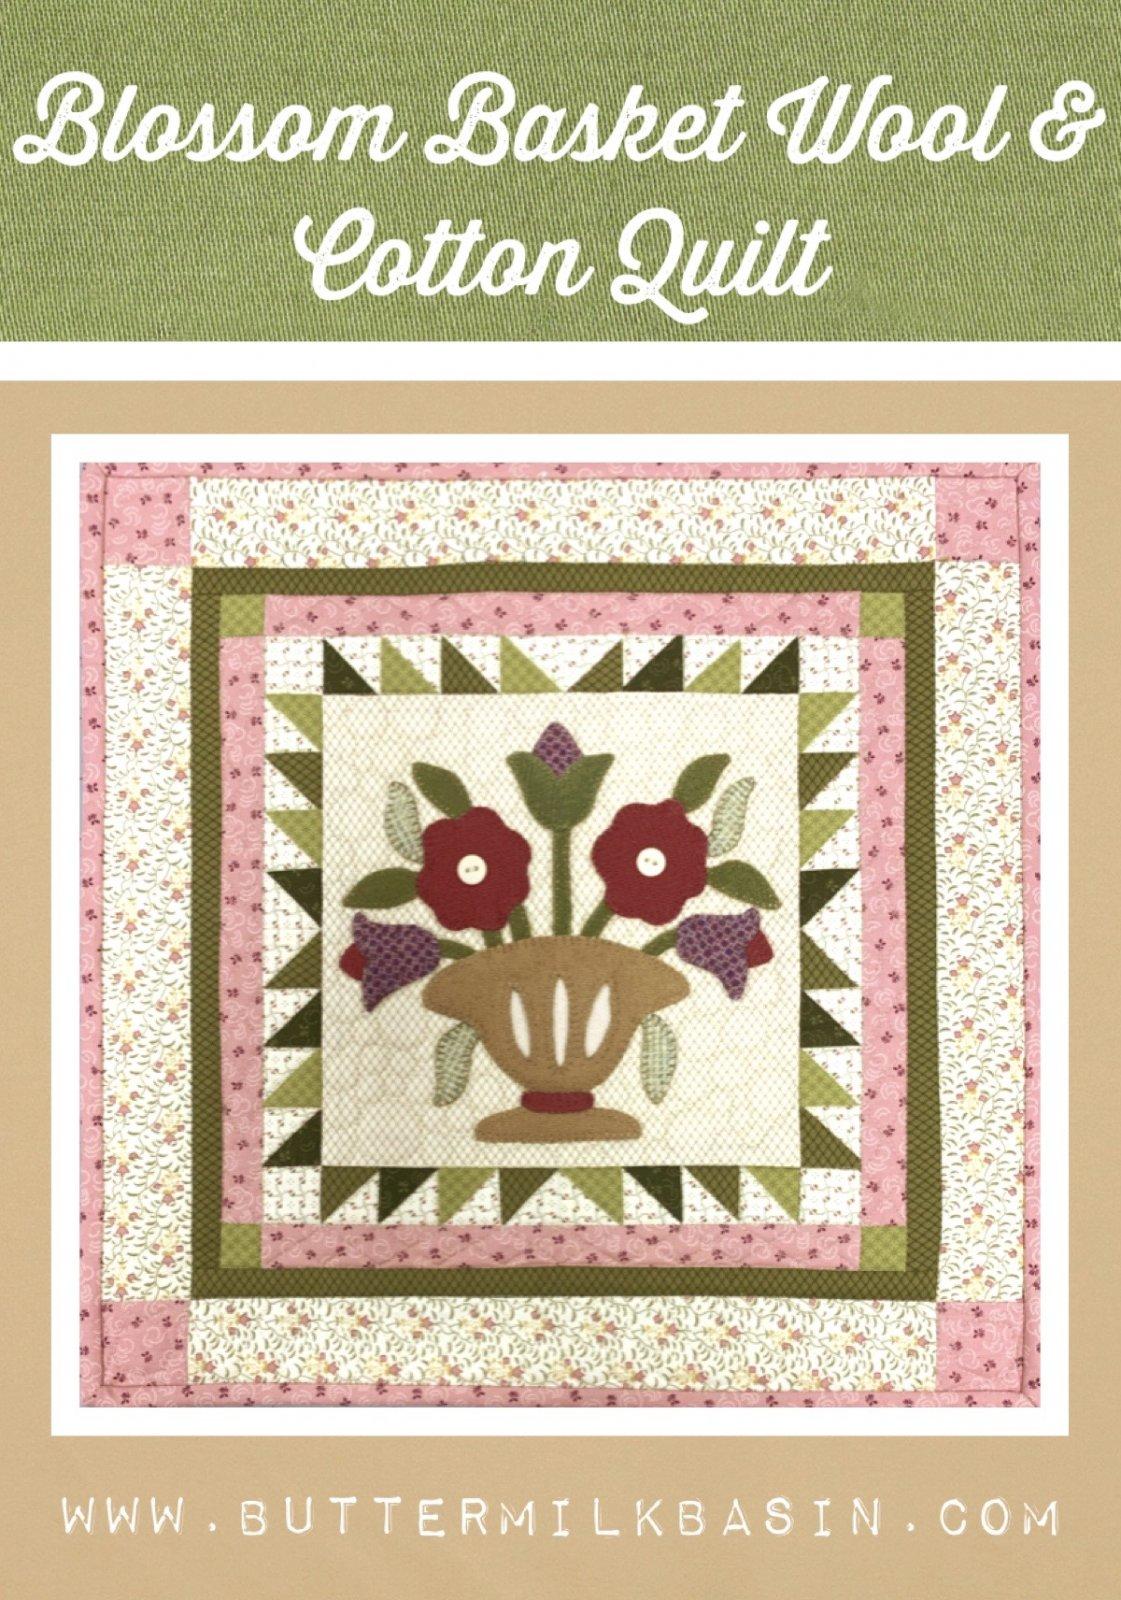 Blossom Basket Wool & Cotton Quilt * Kit & Pattern